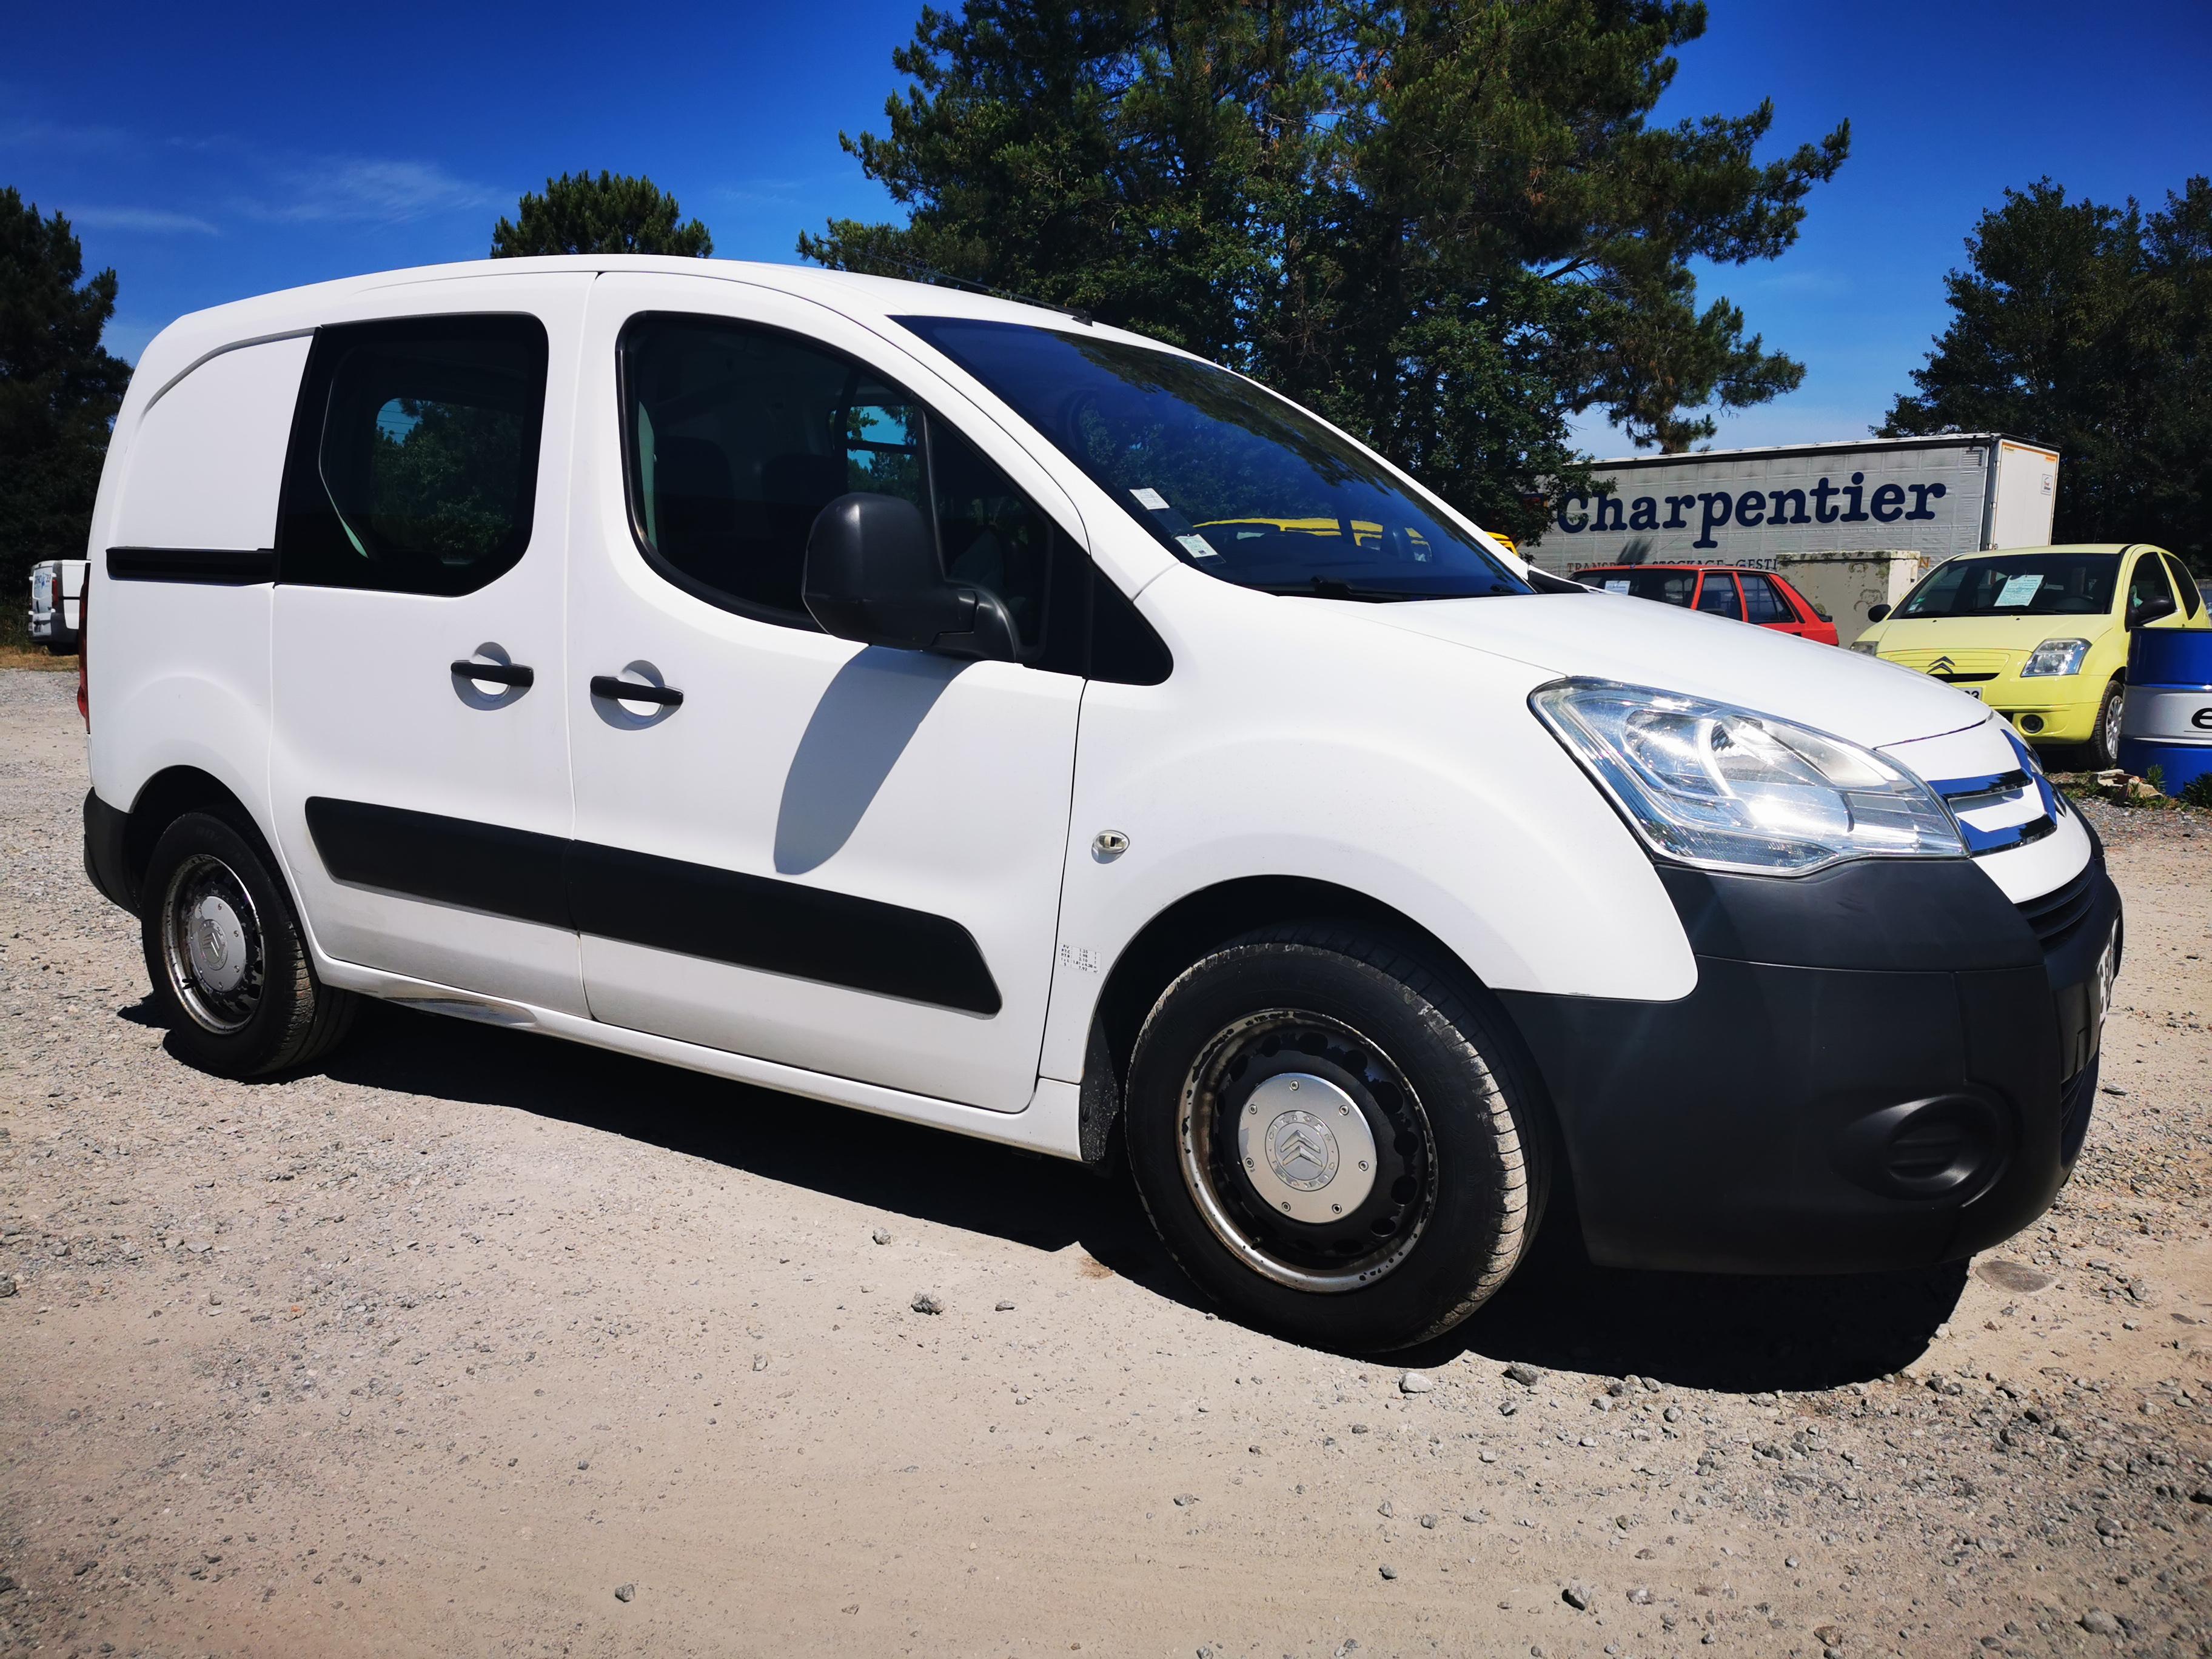 A vendre Citroën Berlingo 1.6 hDi 90cv fourgonnette de 2009 en bel état